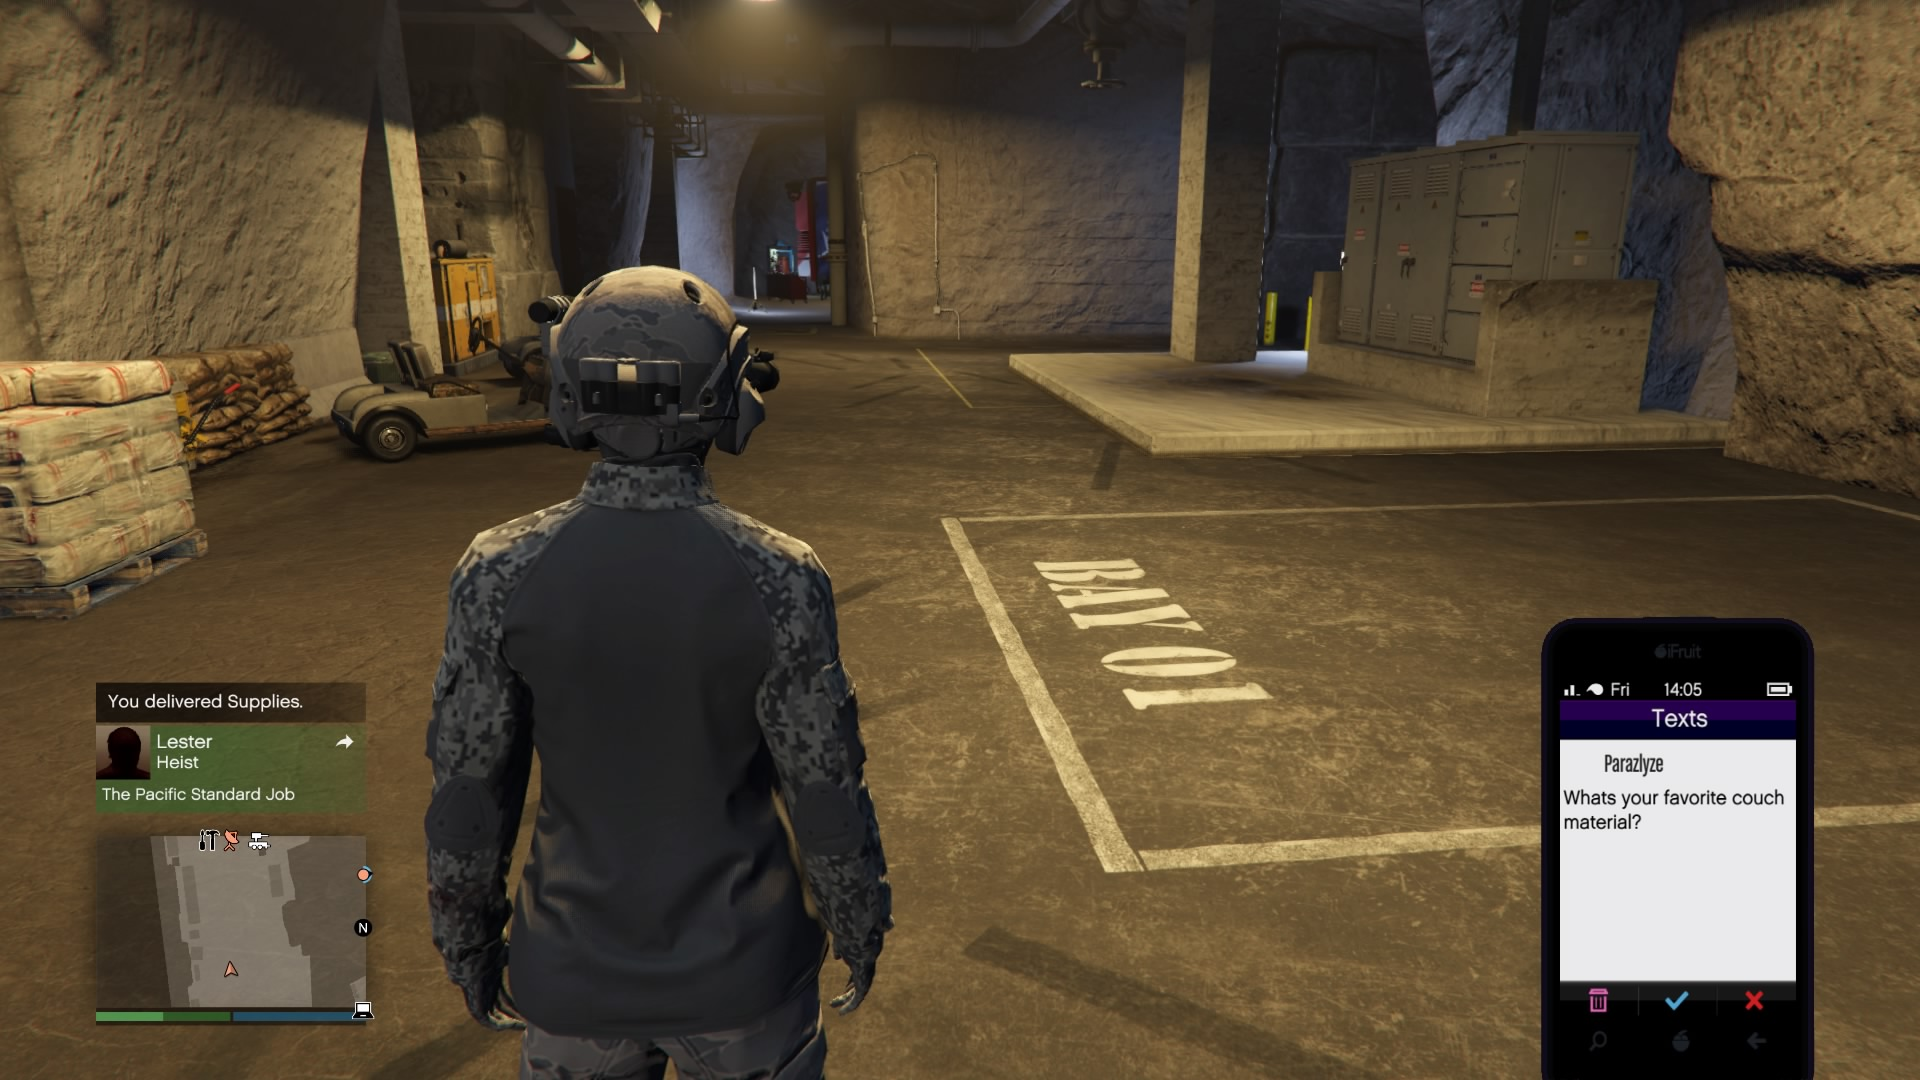 Grand_Theft_Auto_V_20170917140413.jpg